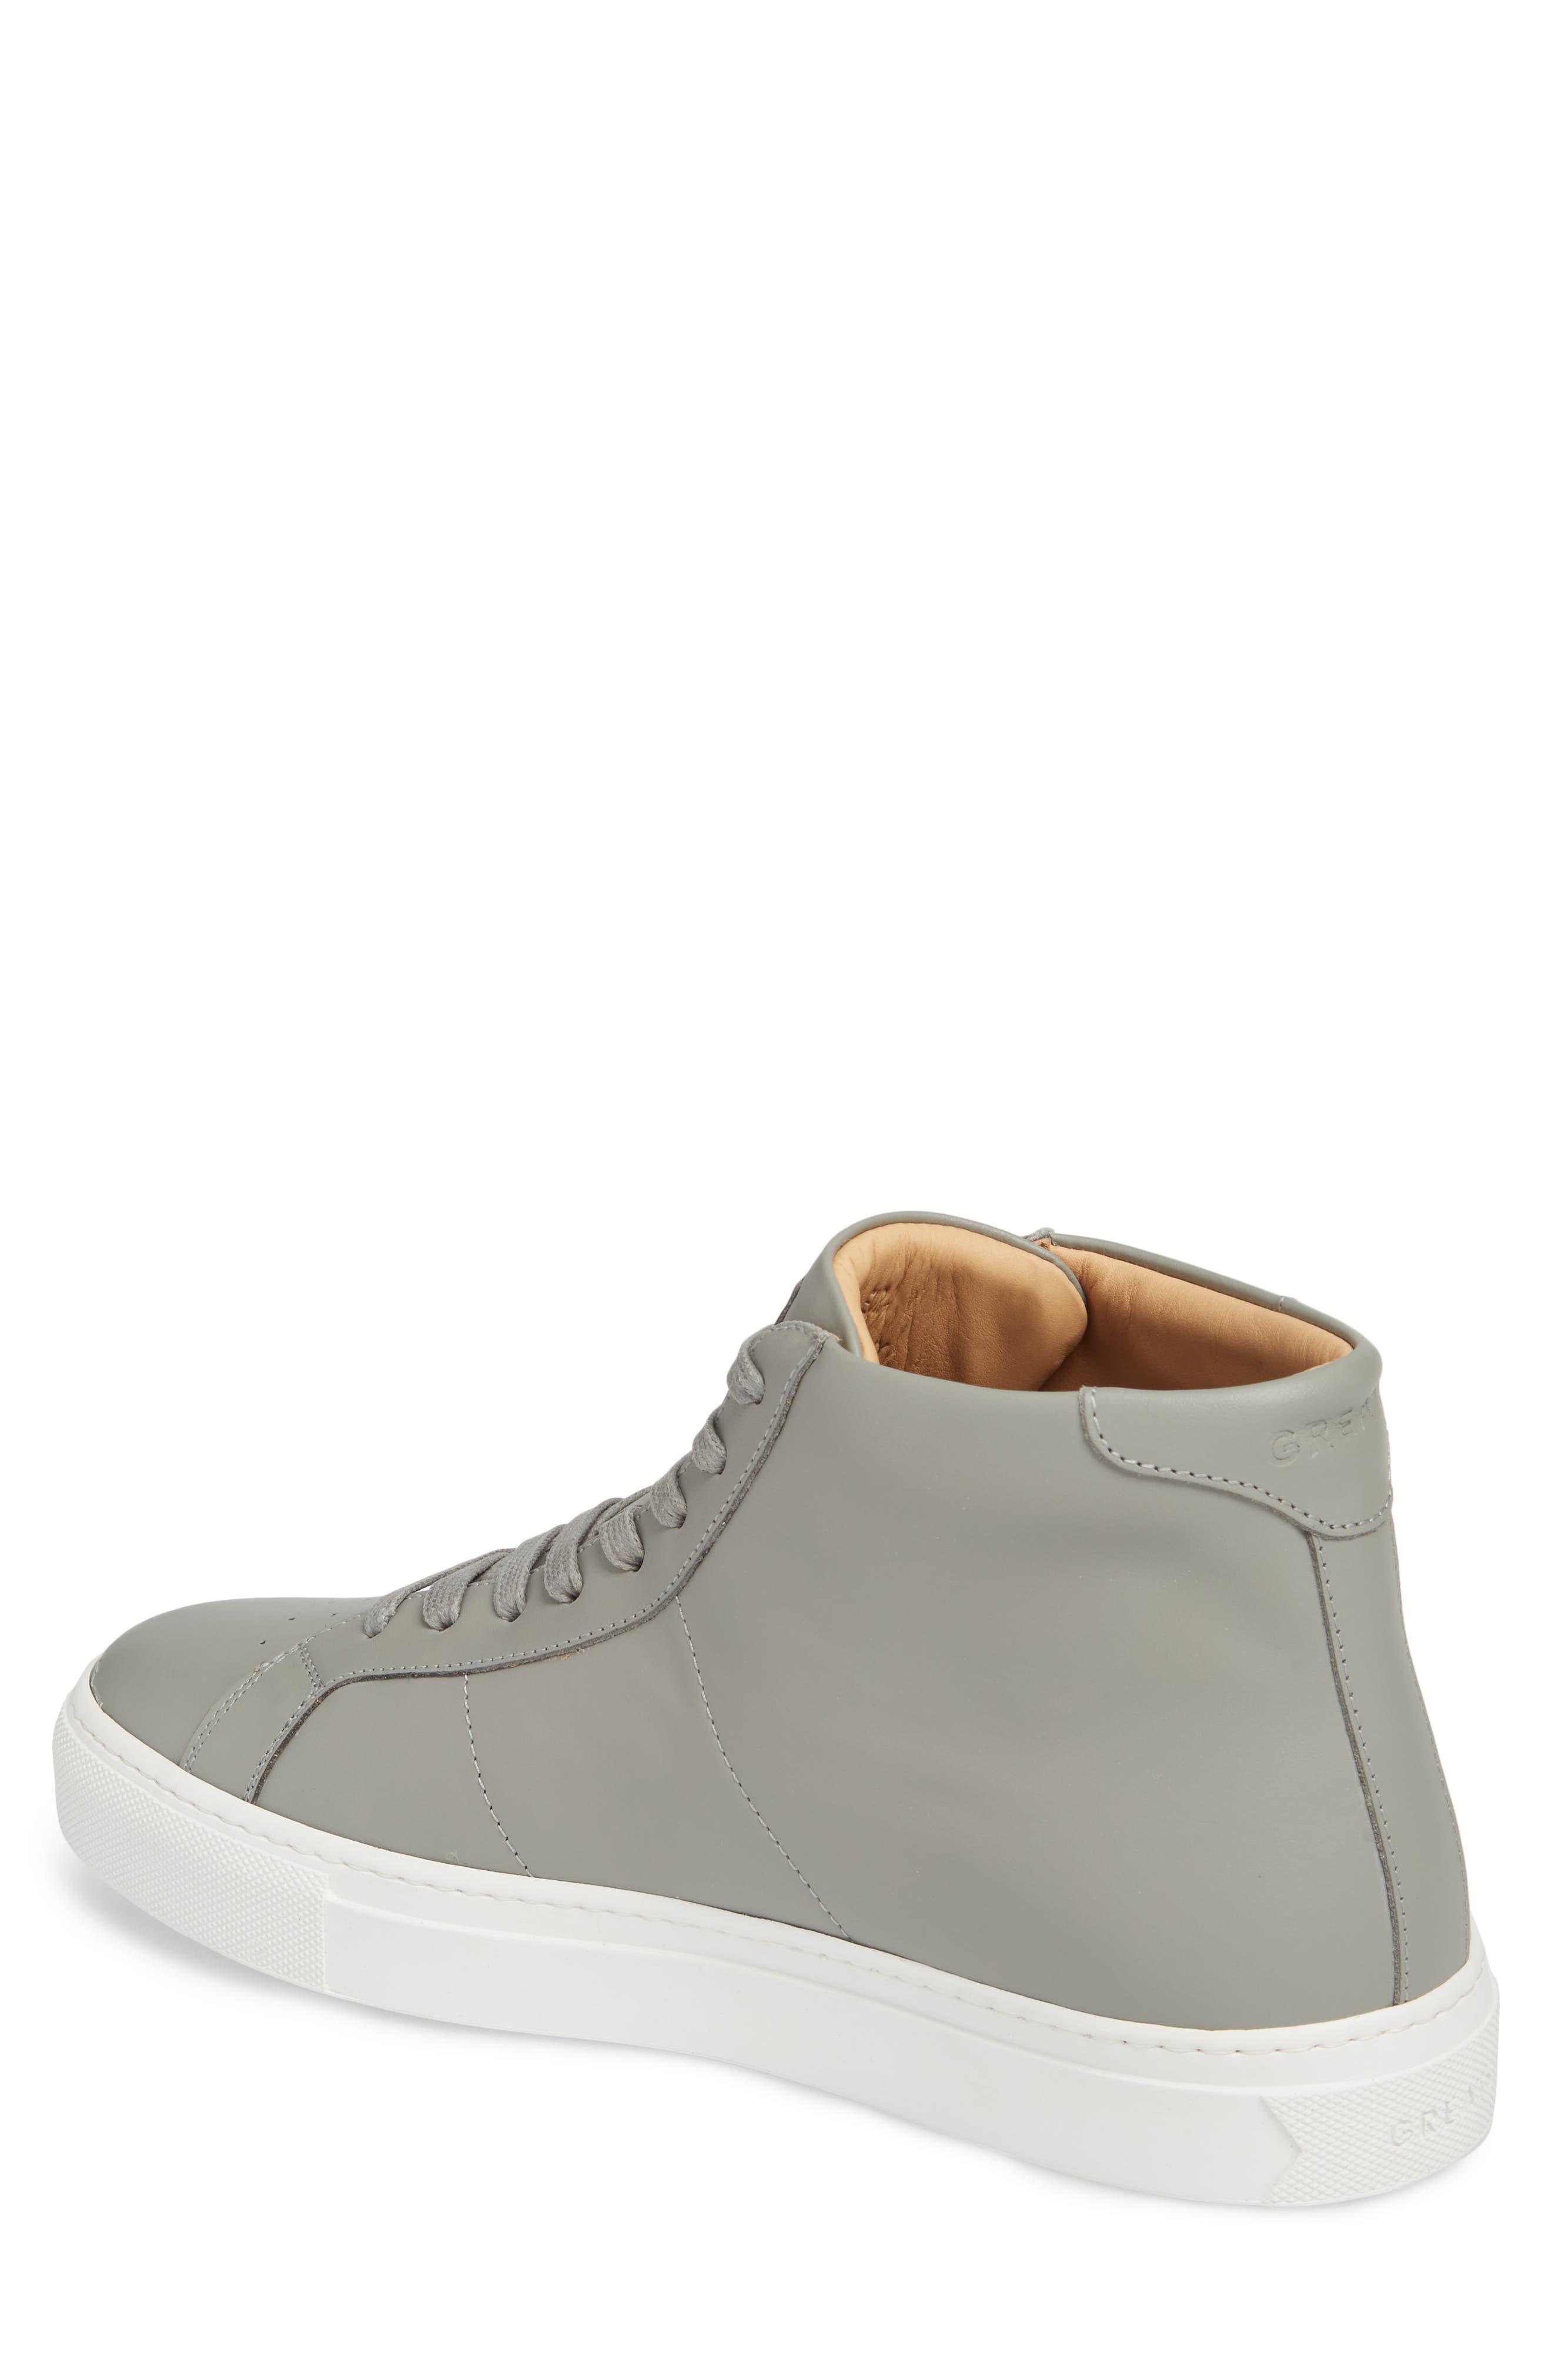 Alternate Image 2  - Greats Royale High Top Sneaker (Men)